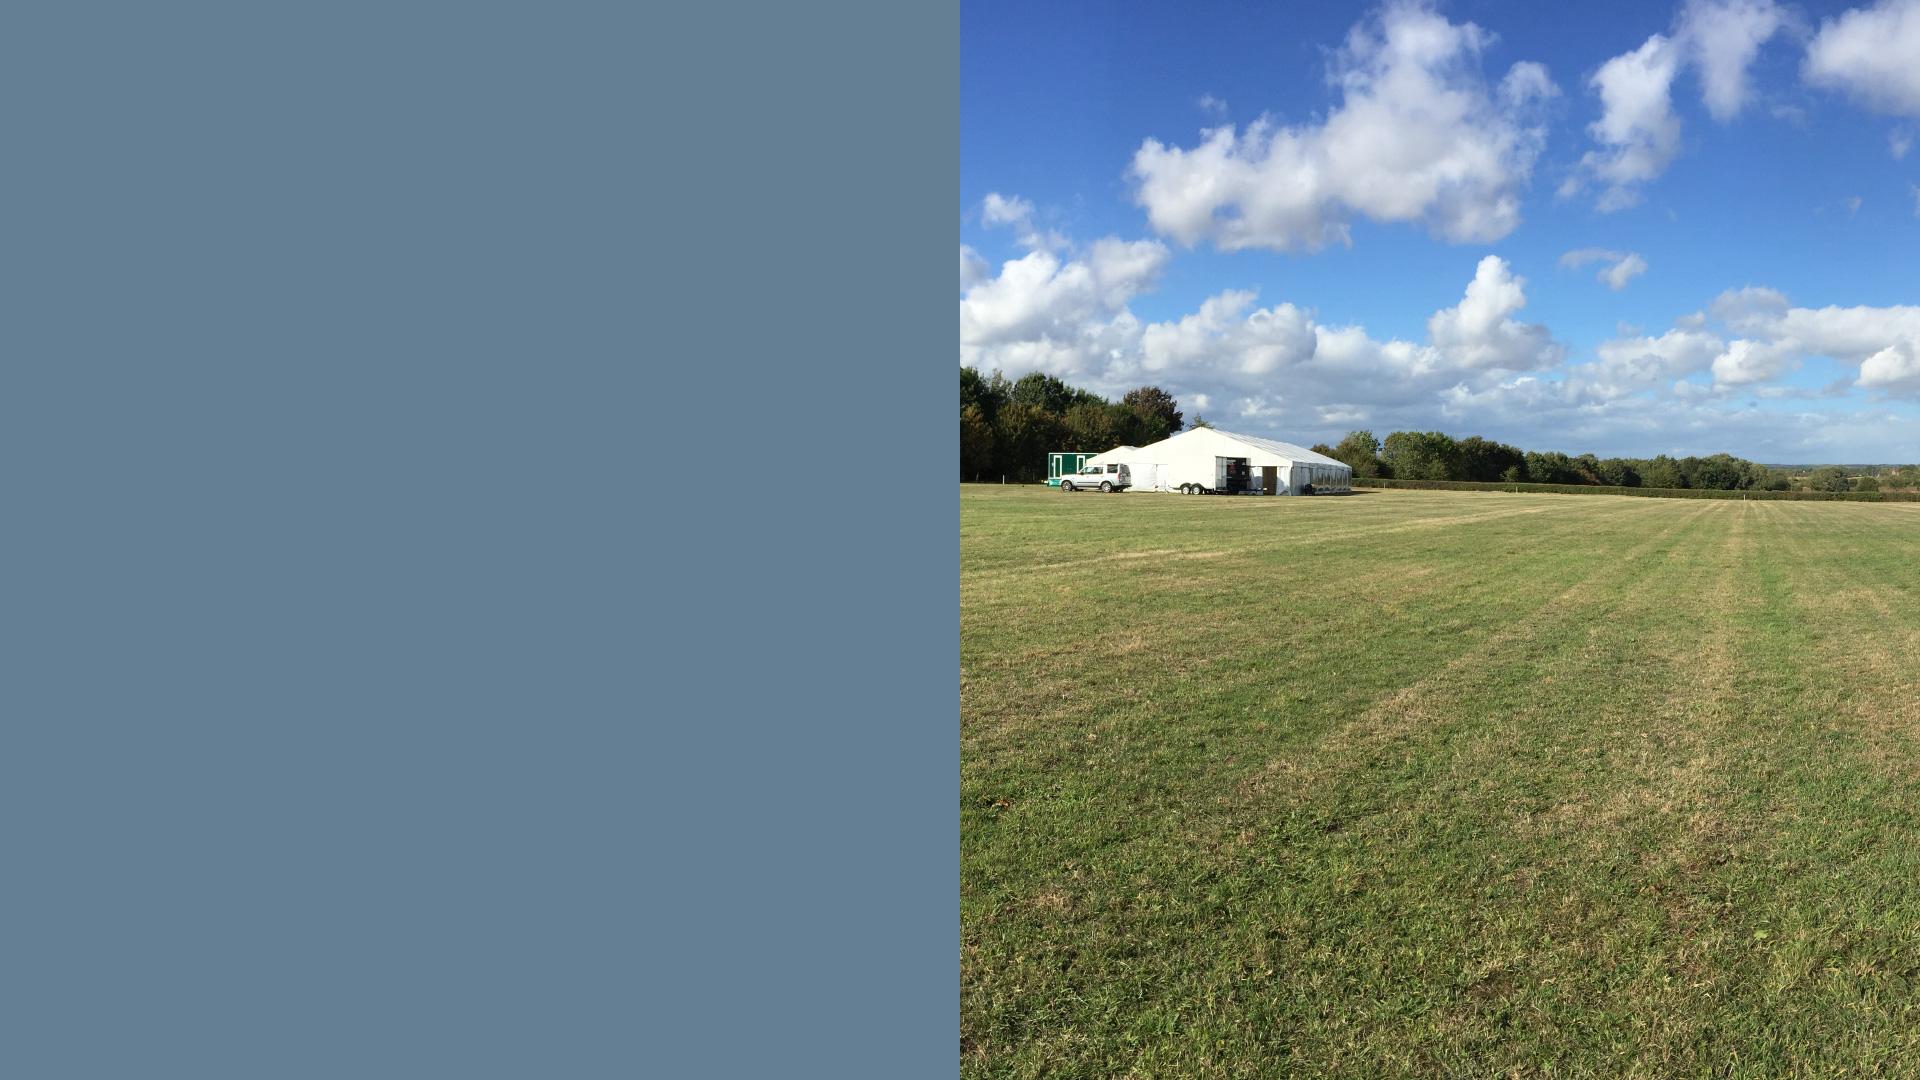 Willow Farm home of Flint & Lambourn Marquees Ltd